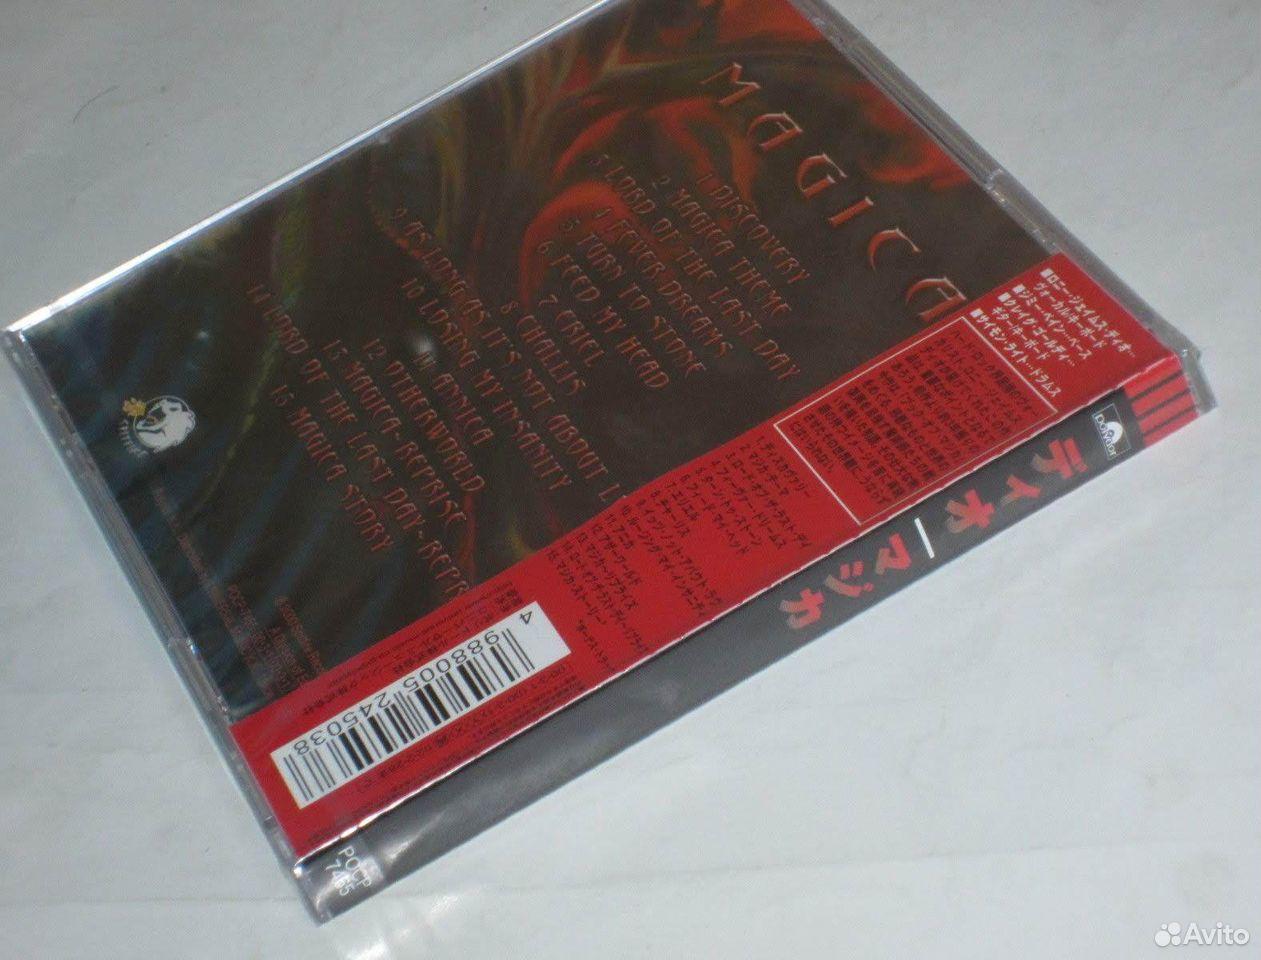 DIO - Magica 2000 Japan CD 1 Press pocp-7465 Новый